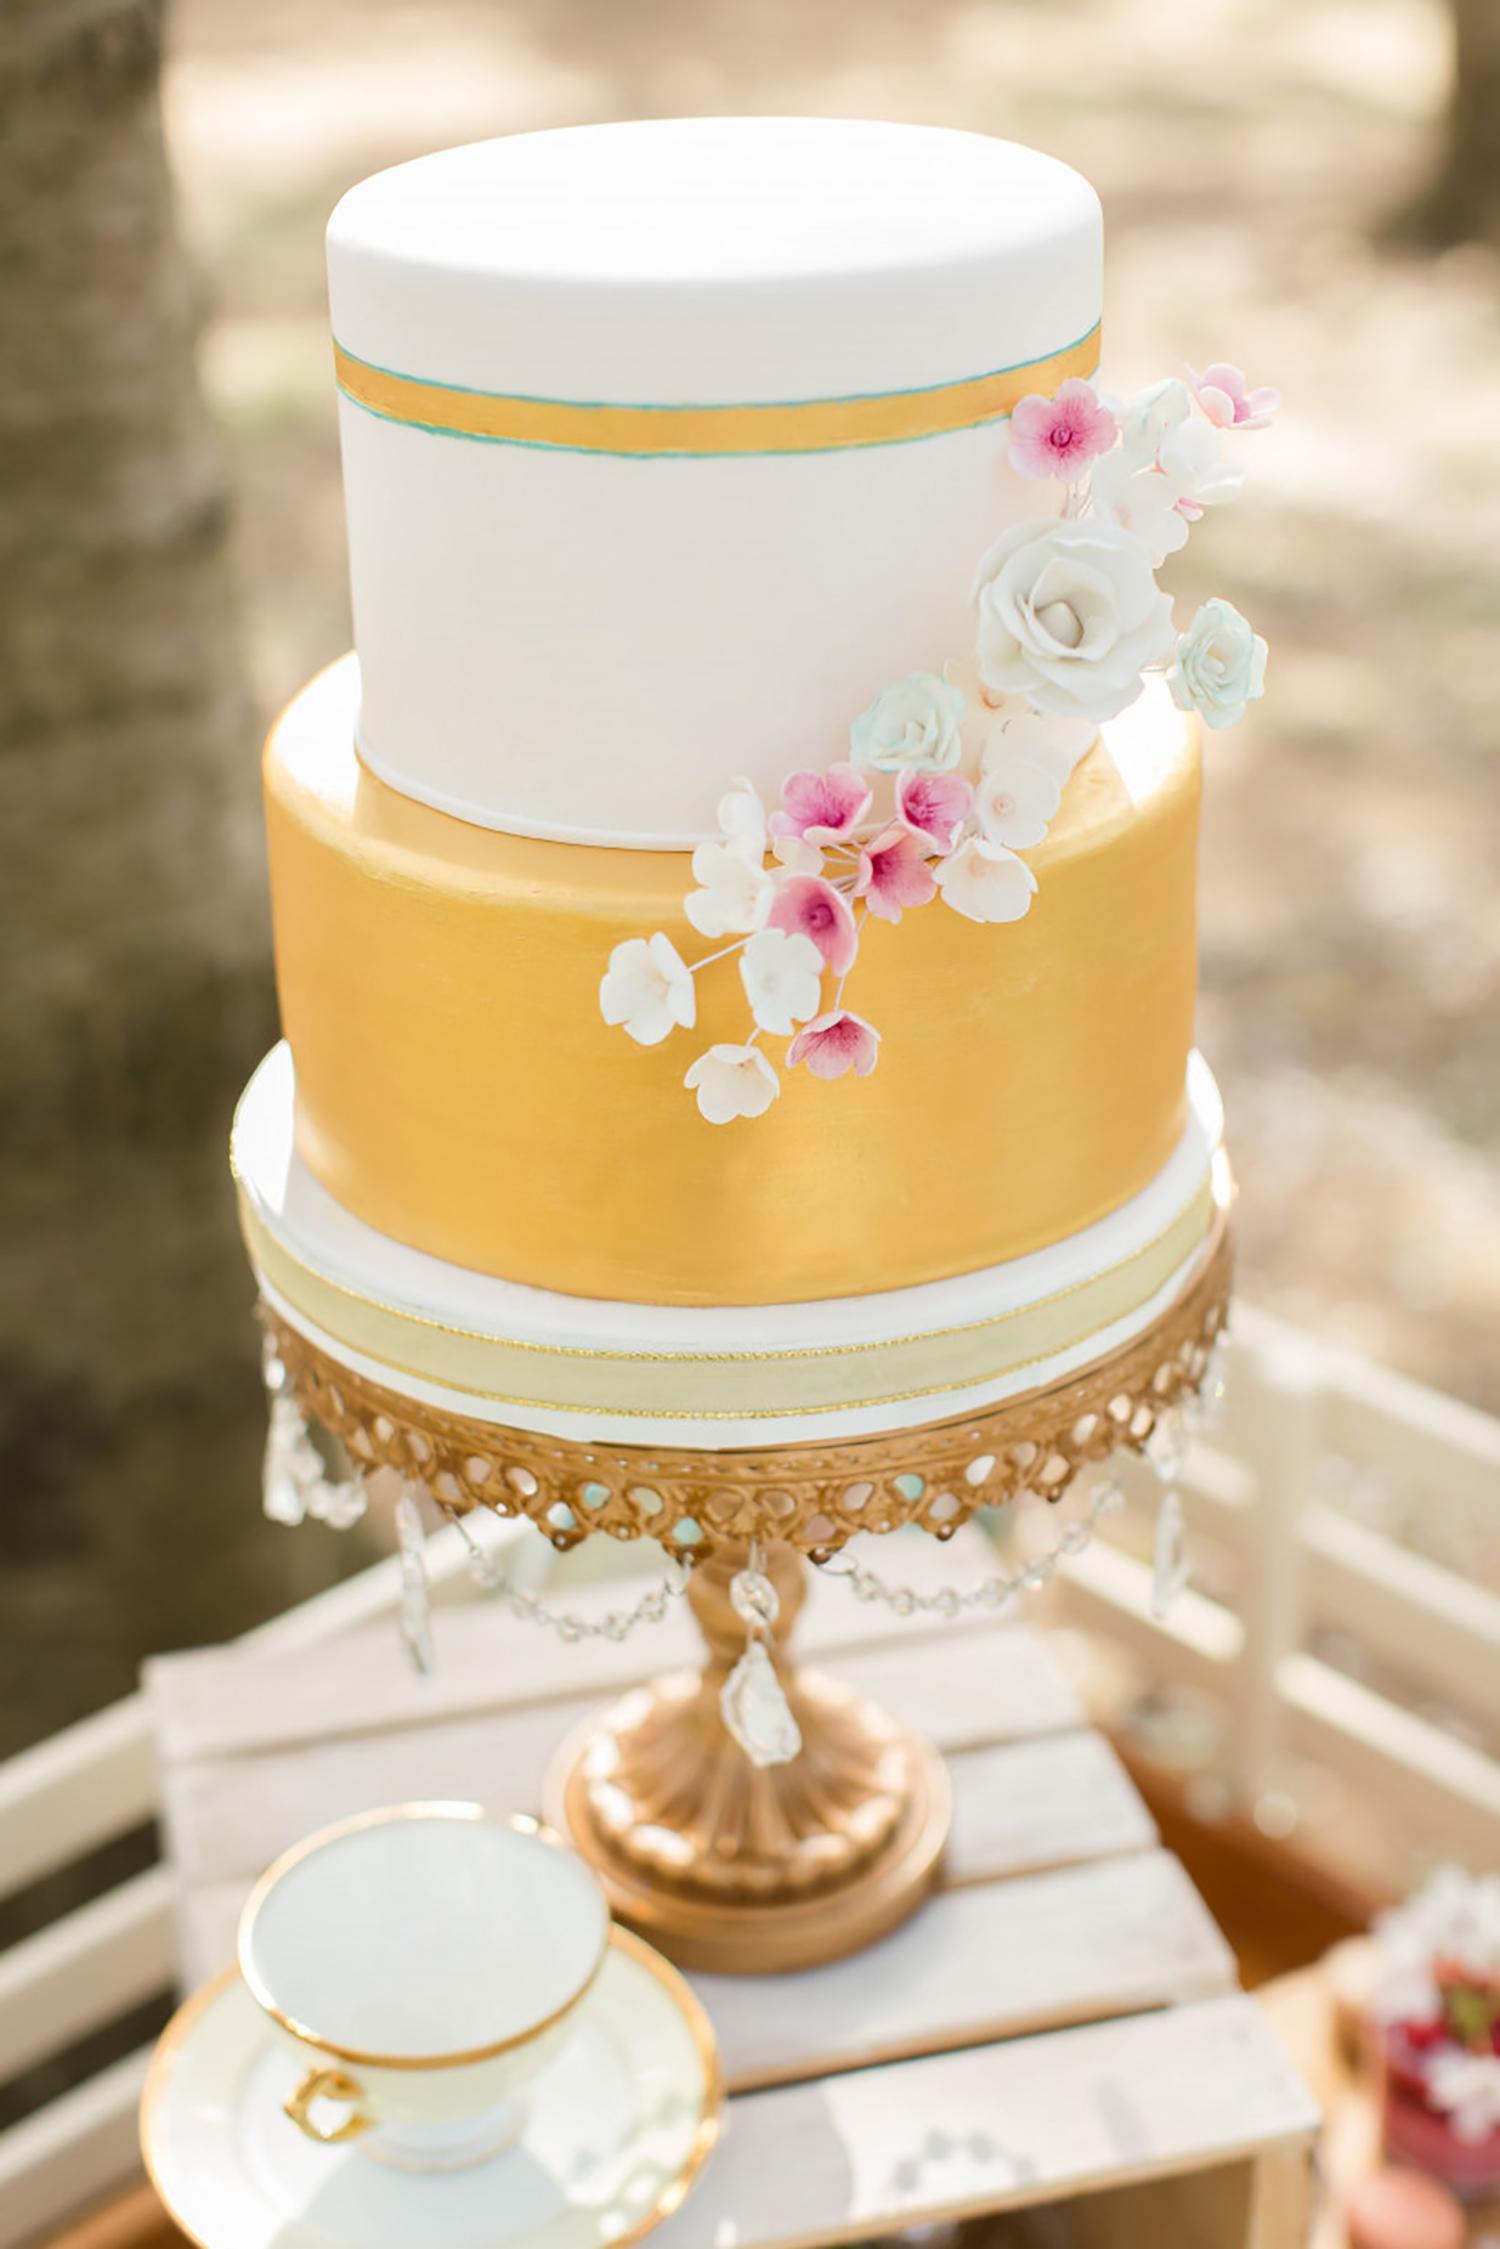 wedding cake opulent treasures gold cake stand_HiRES.jpg